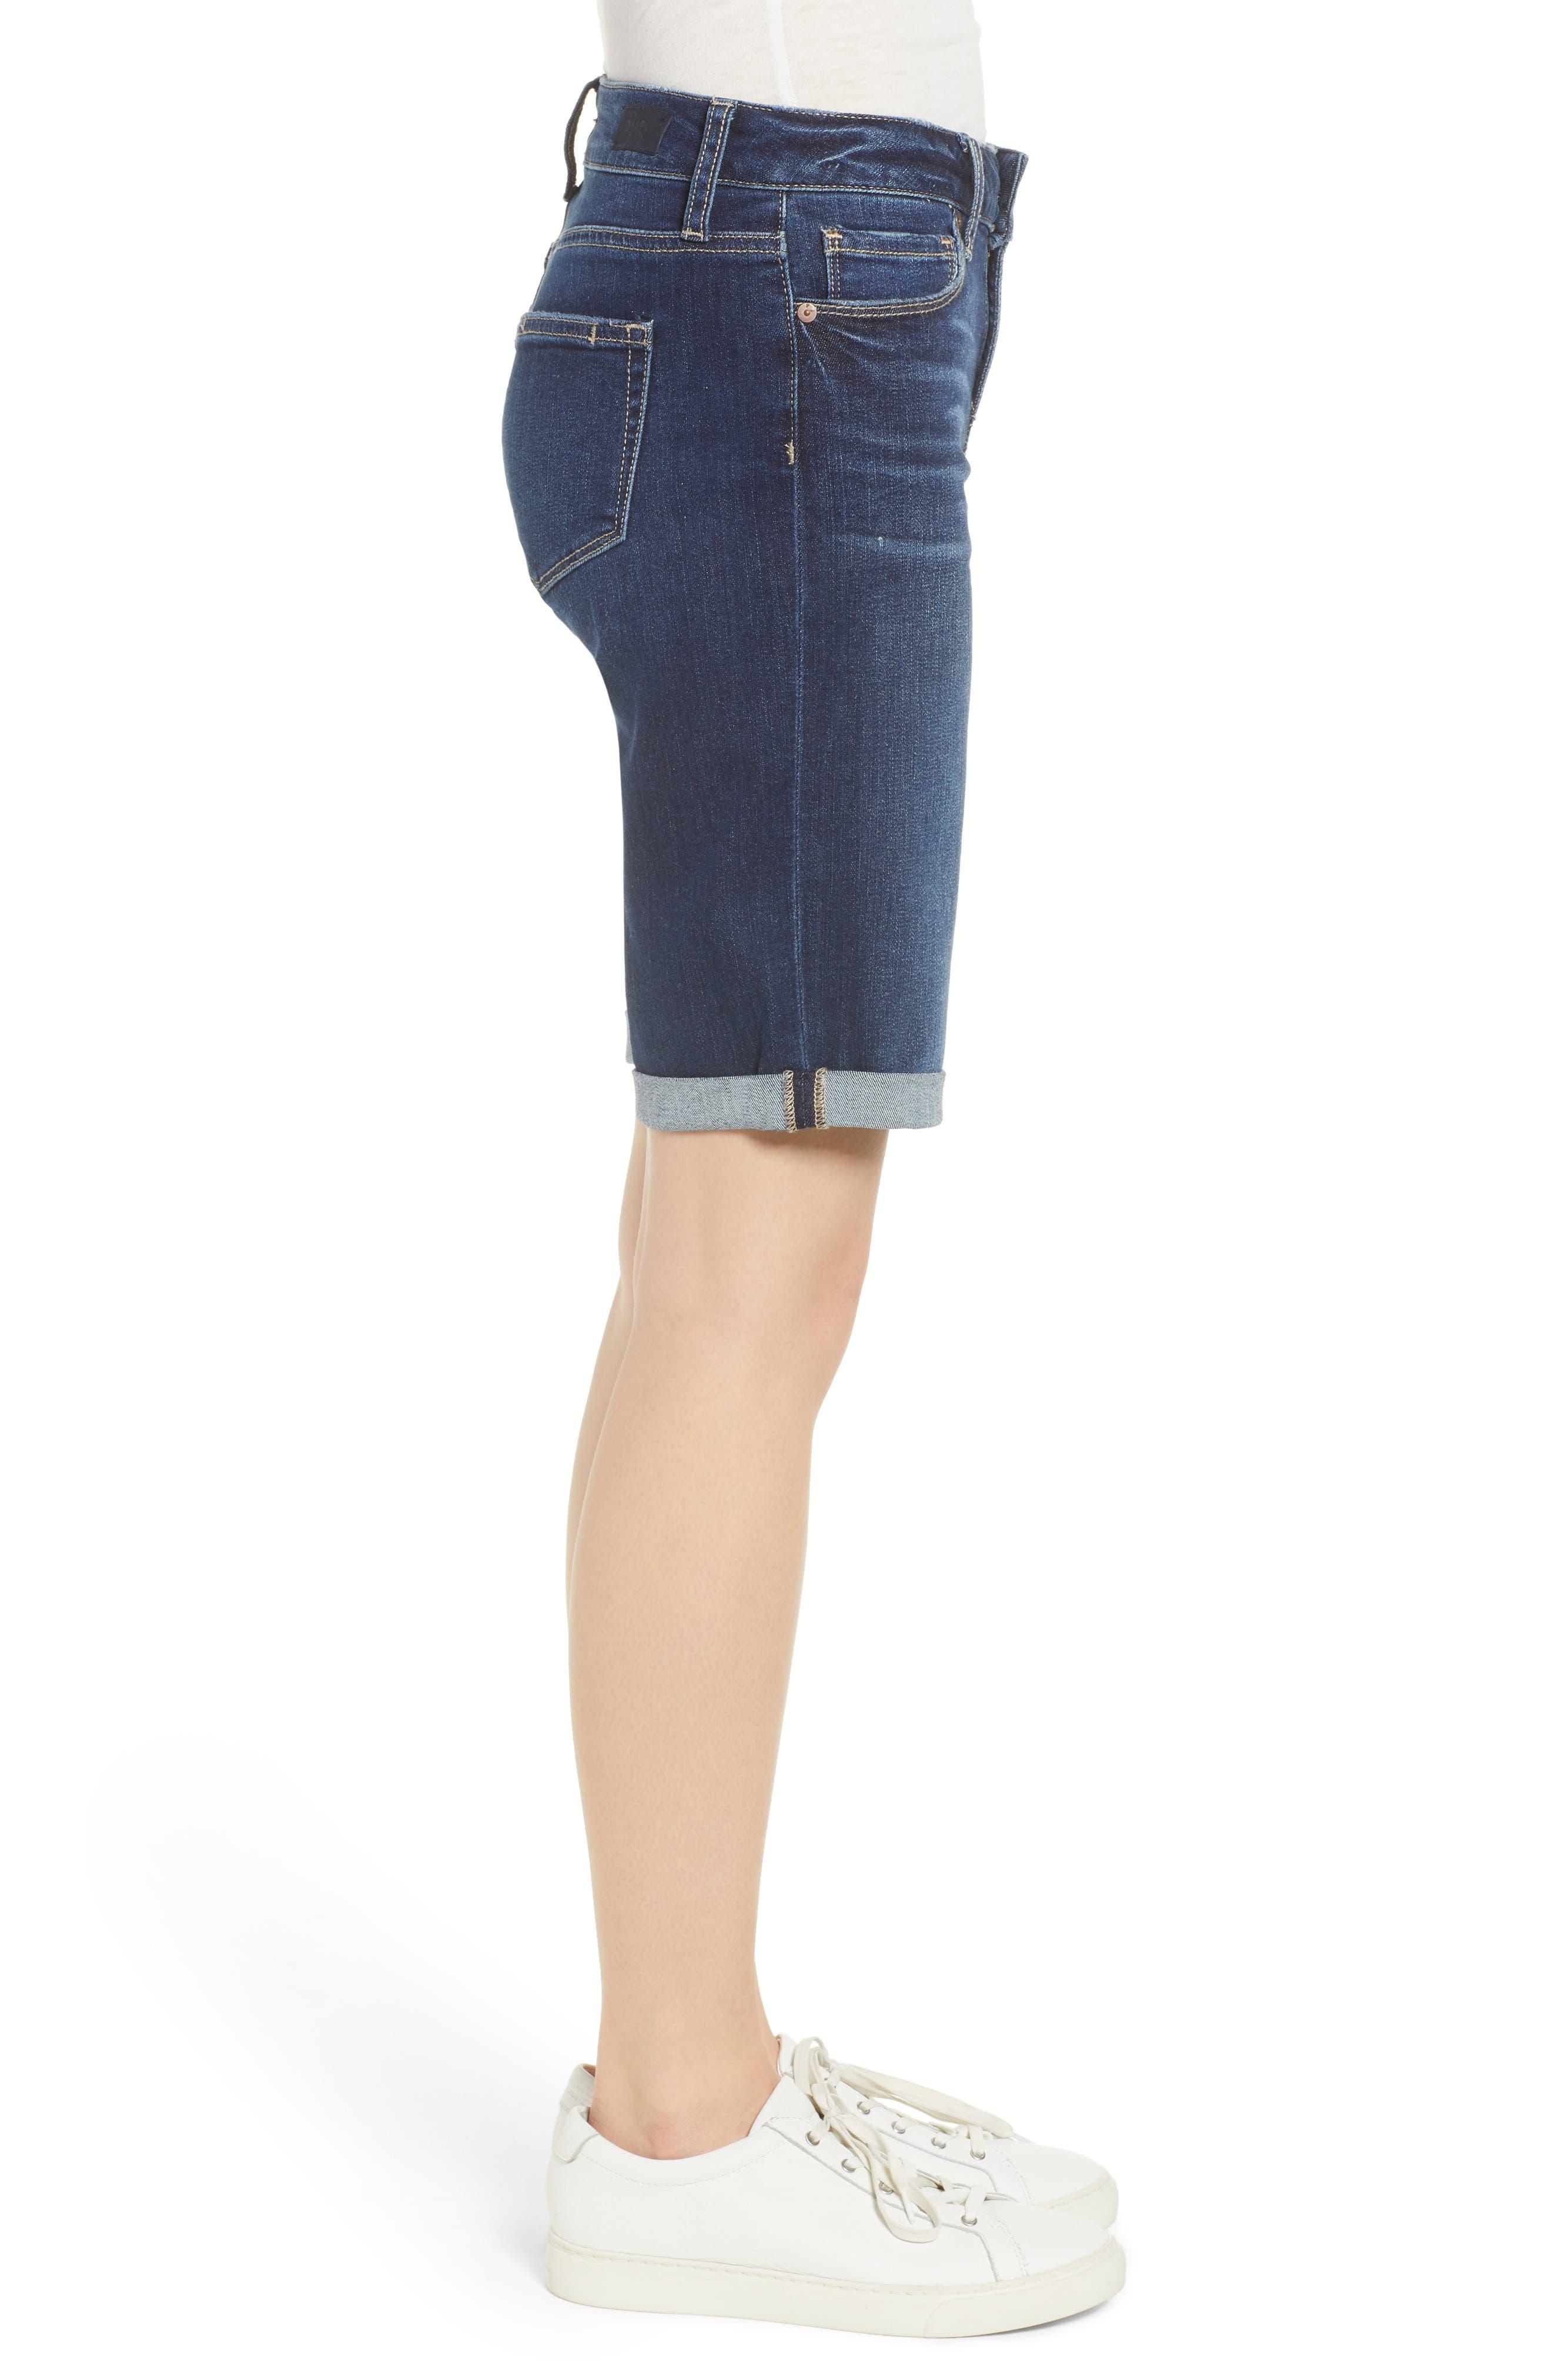 Transcend Vintage - Jax Denim Bermuda Shorts,                             Alternate thumbnail 3, color,                             400